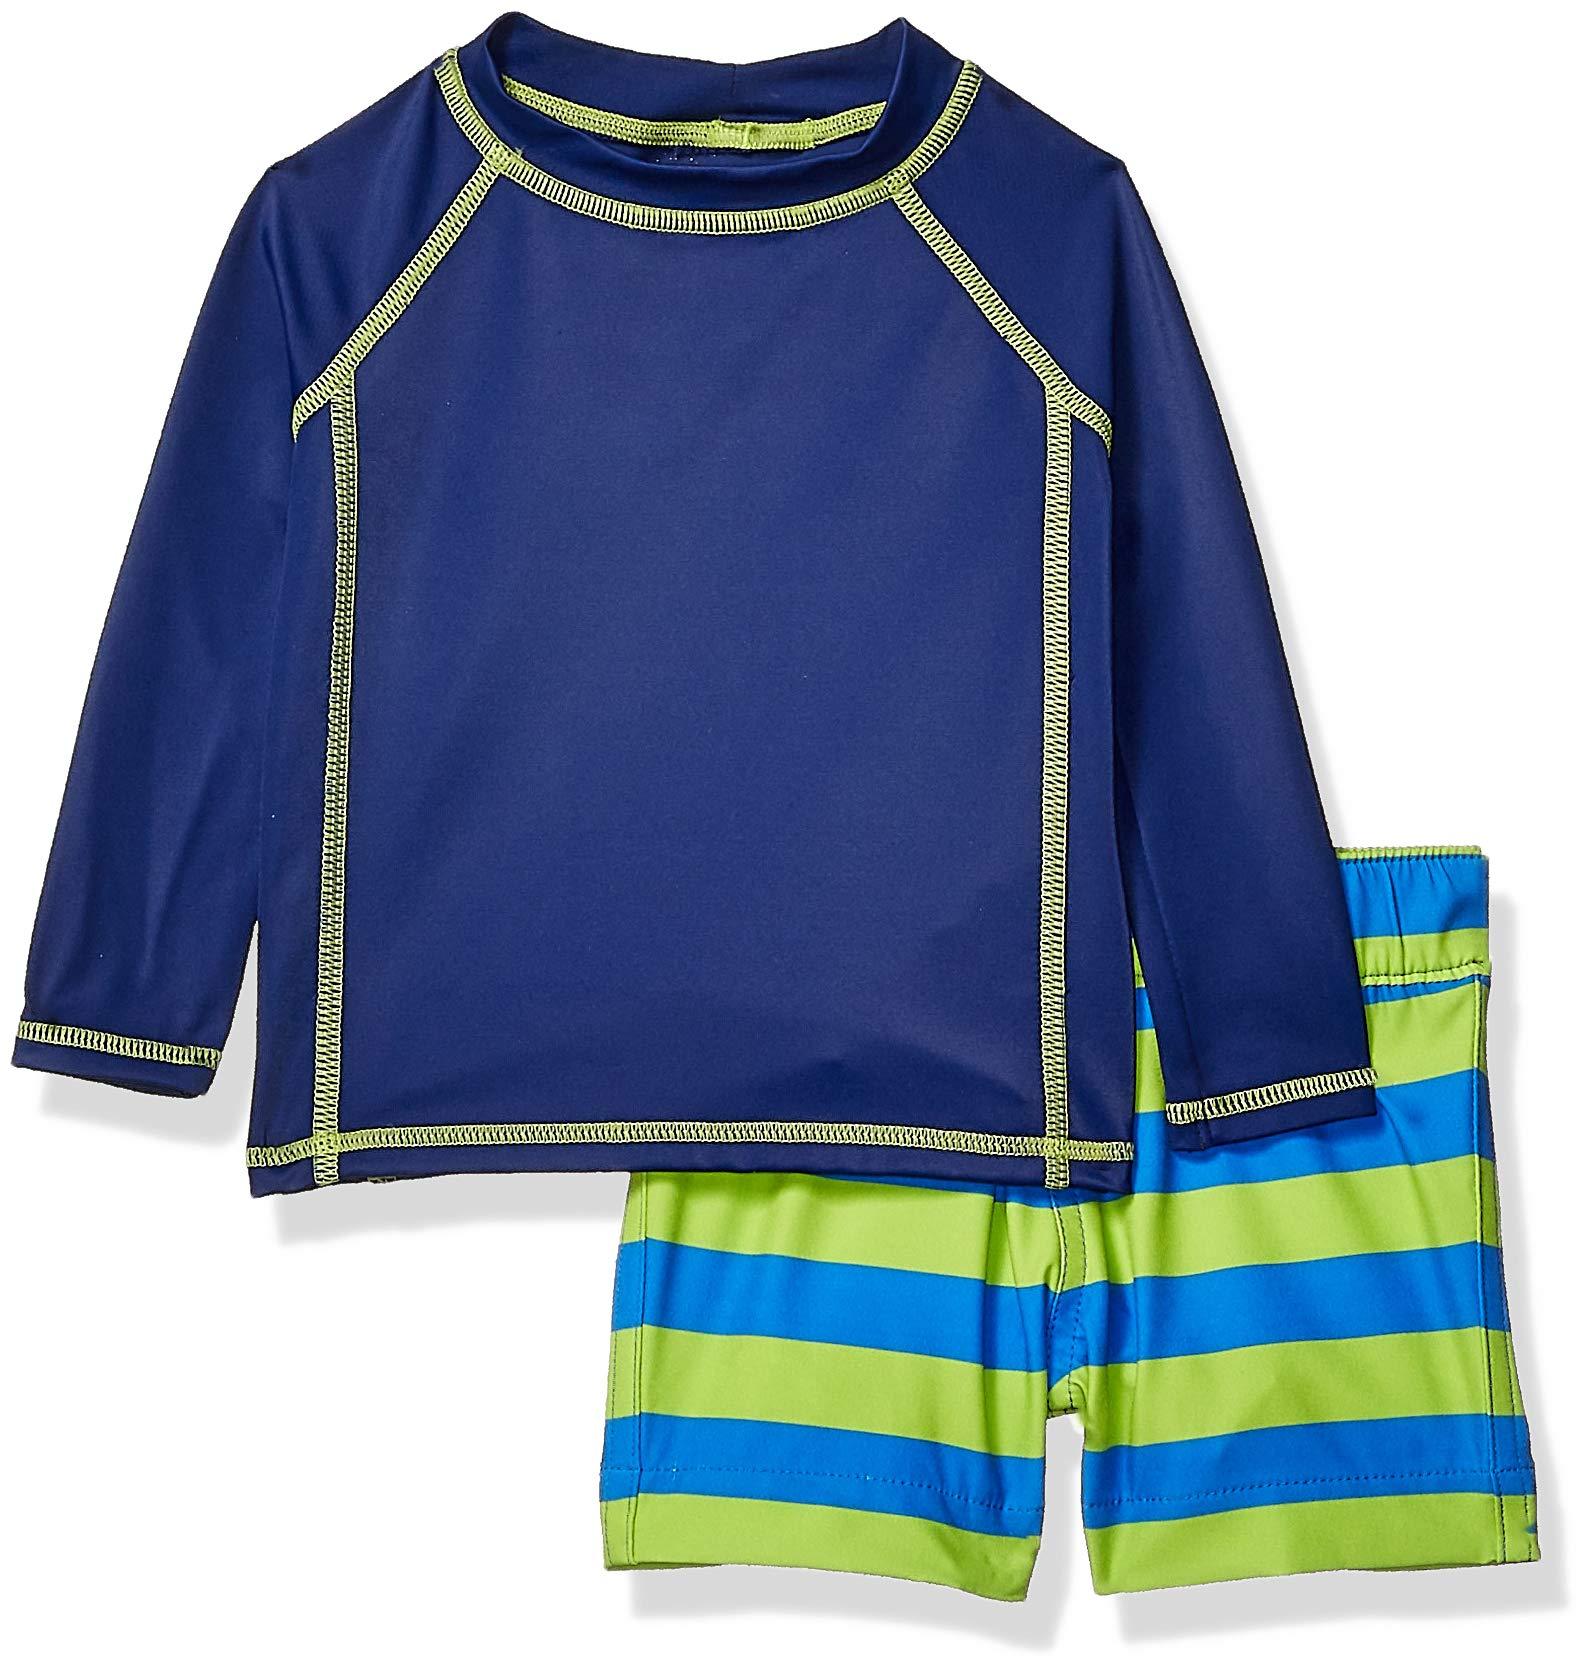 Long-Sleeve Rashguards Essentials Boys UPF 50